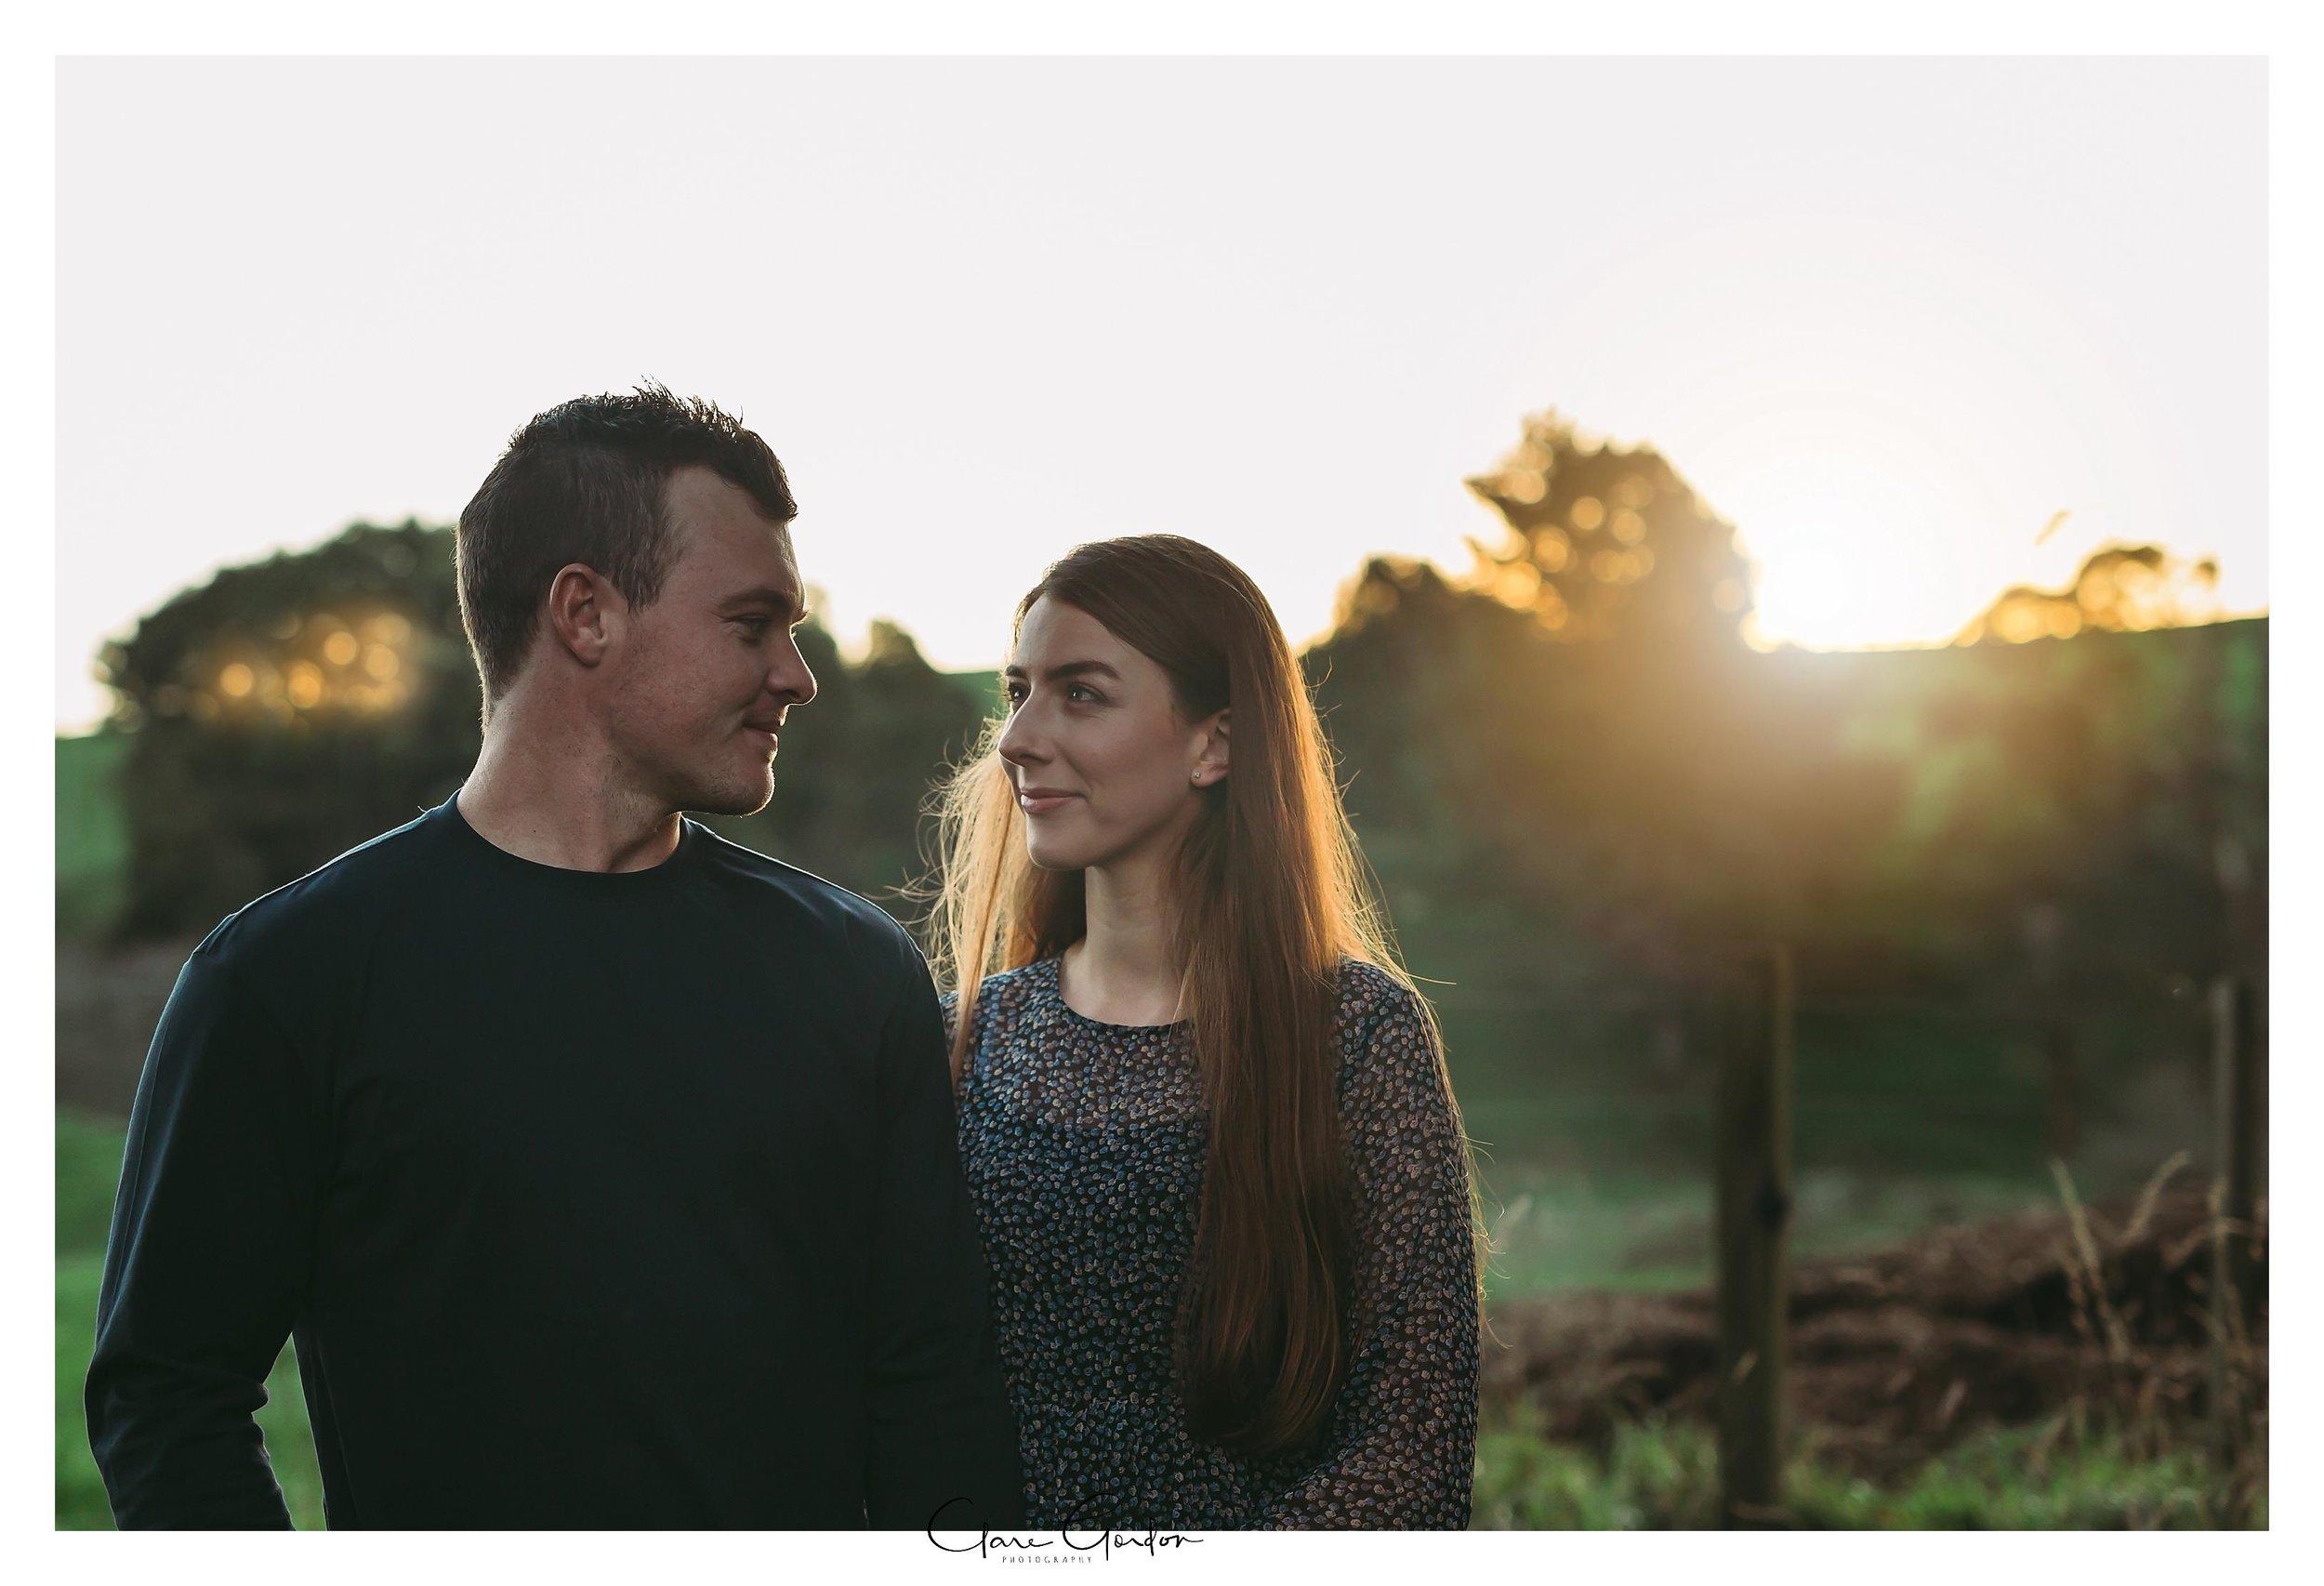 Shaun-Celine-taitua-arboretum-engagement-photos-newzealand-wedding-photographer-waikato-wedding-photographer-waikato-wedding-photography -Hamilton-NZ(1).jpg